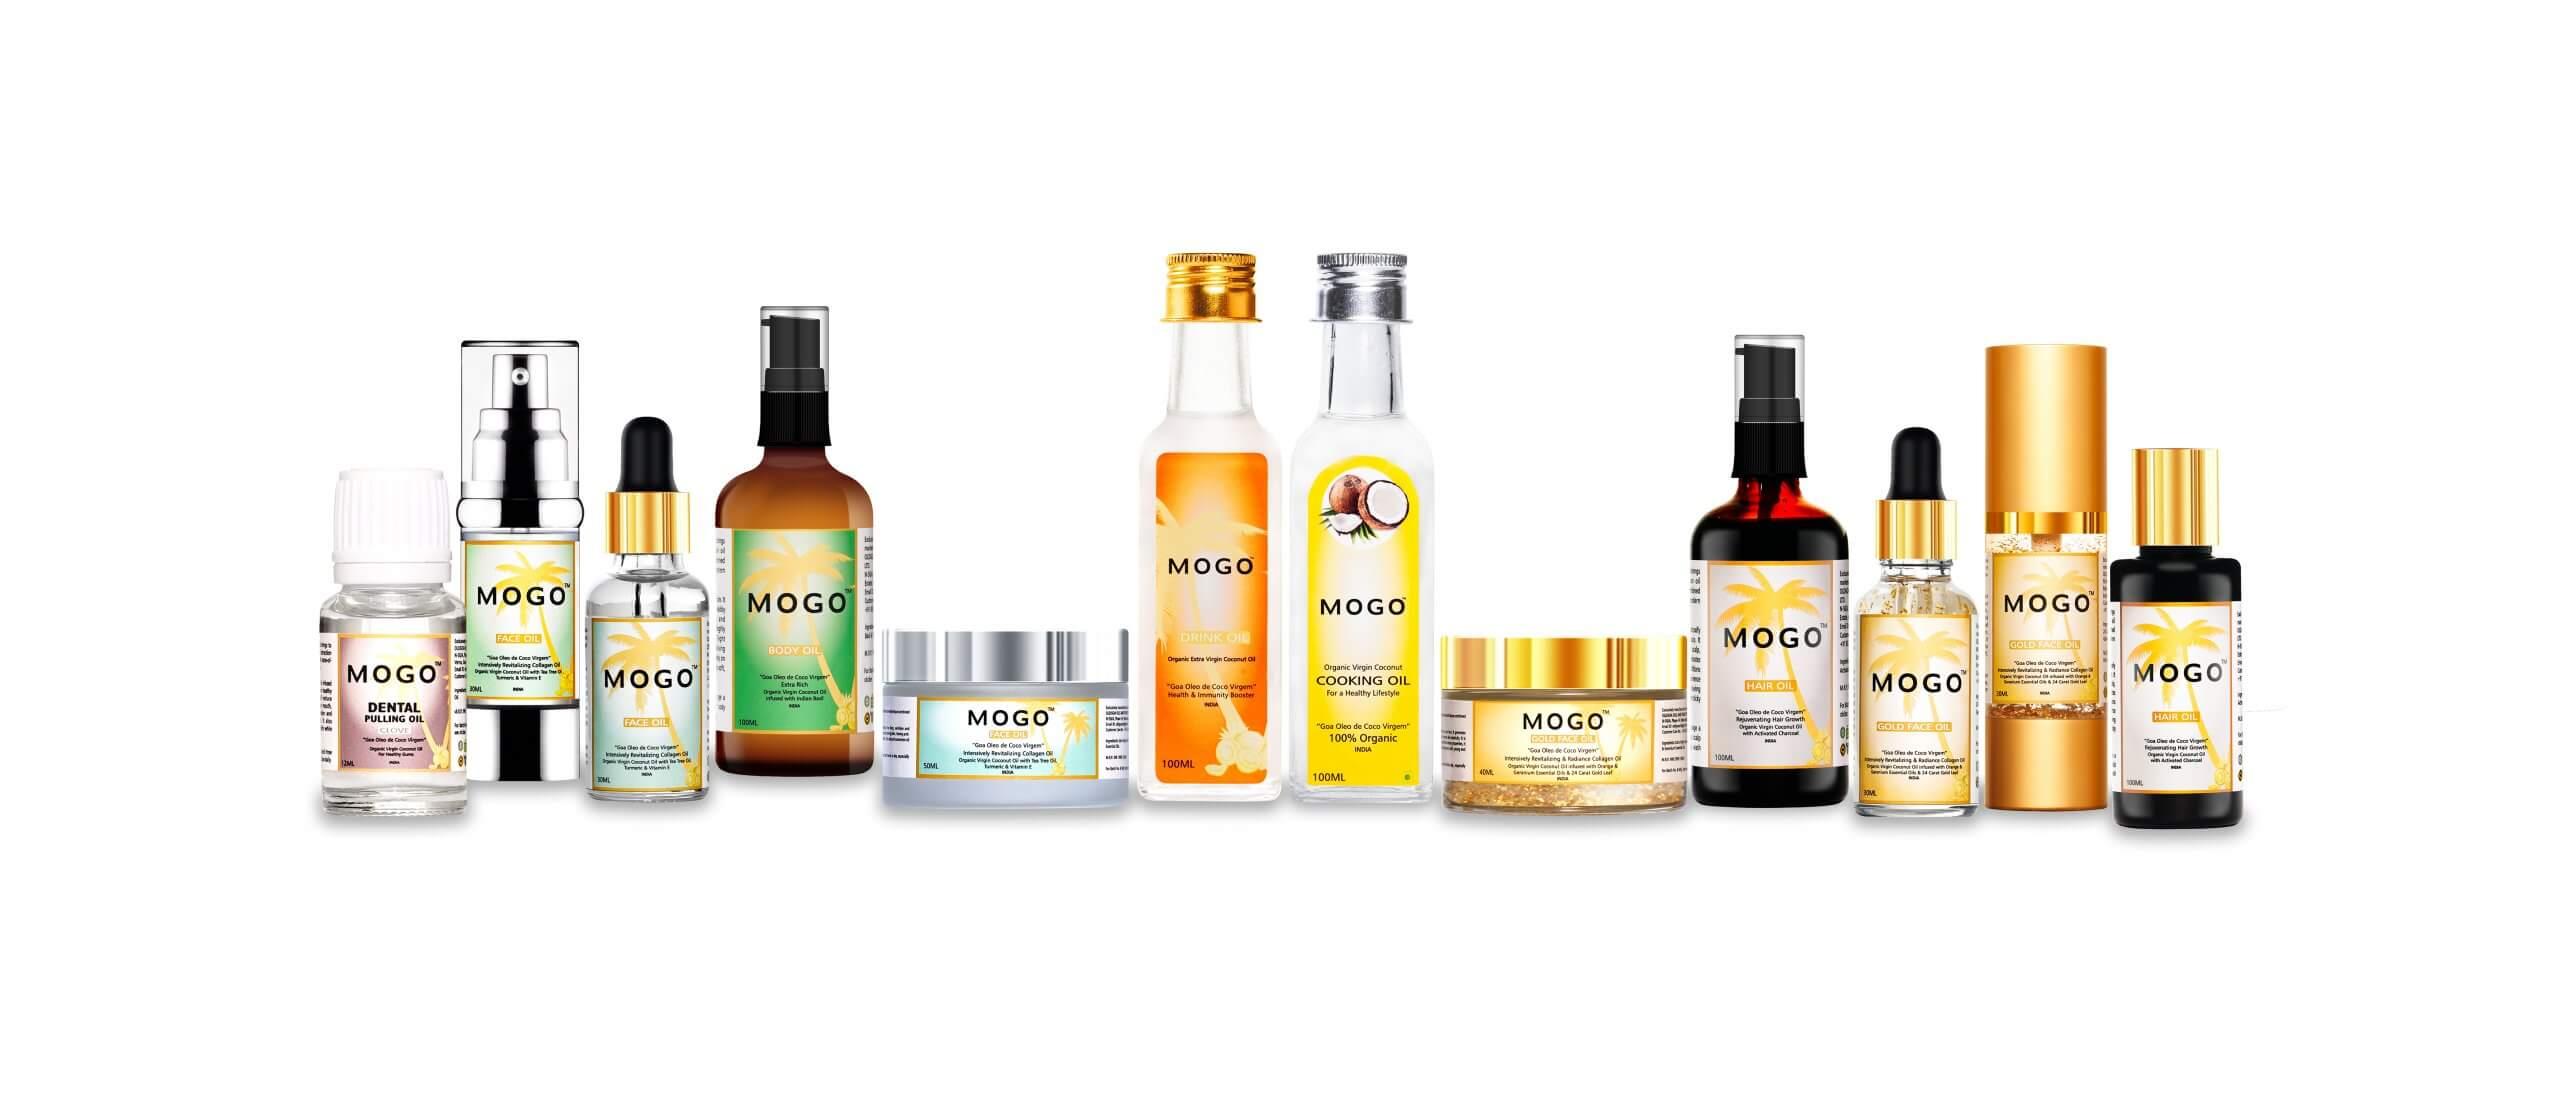 MOGO Virgin Coconut Oil Exporter